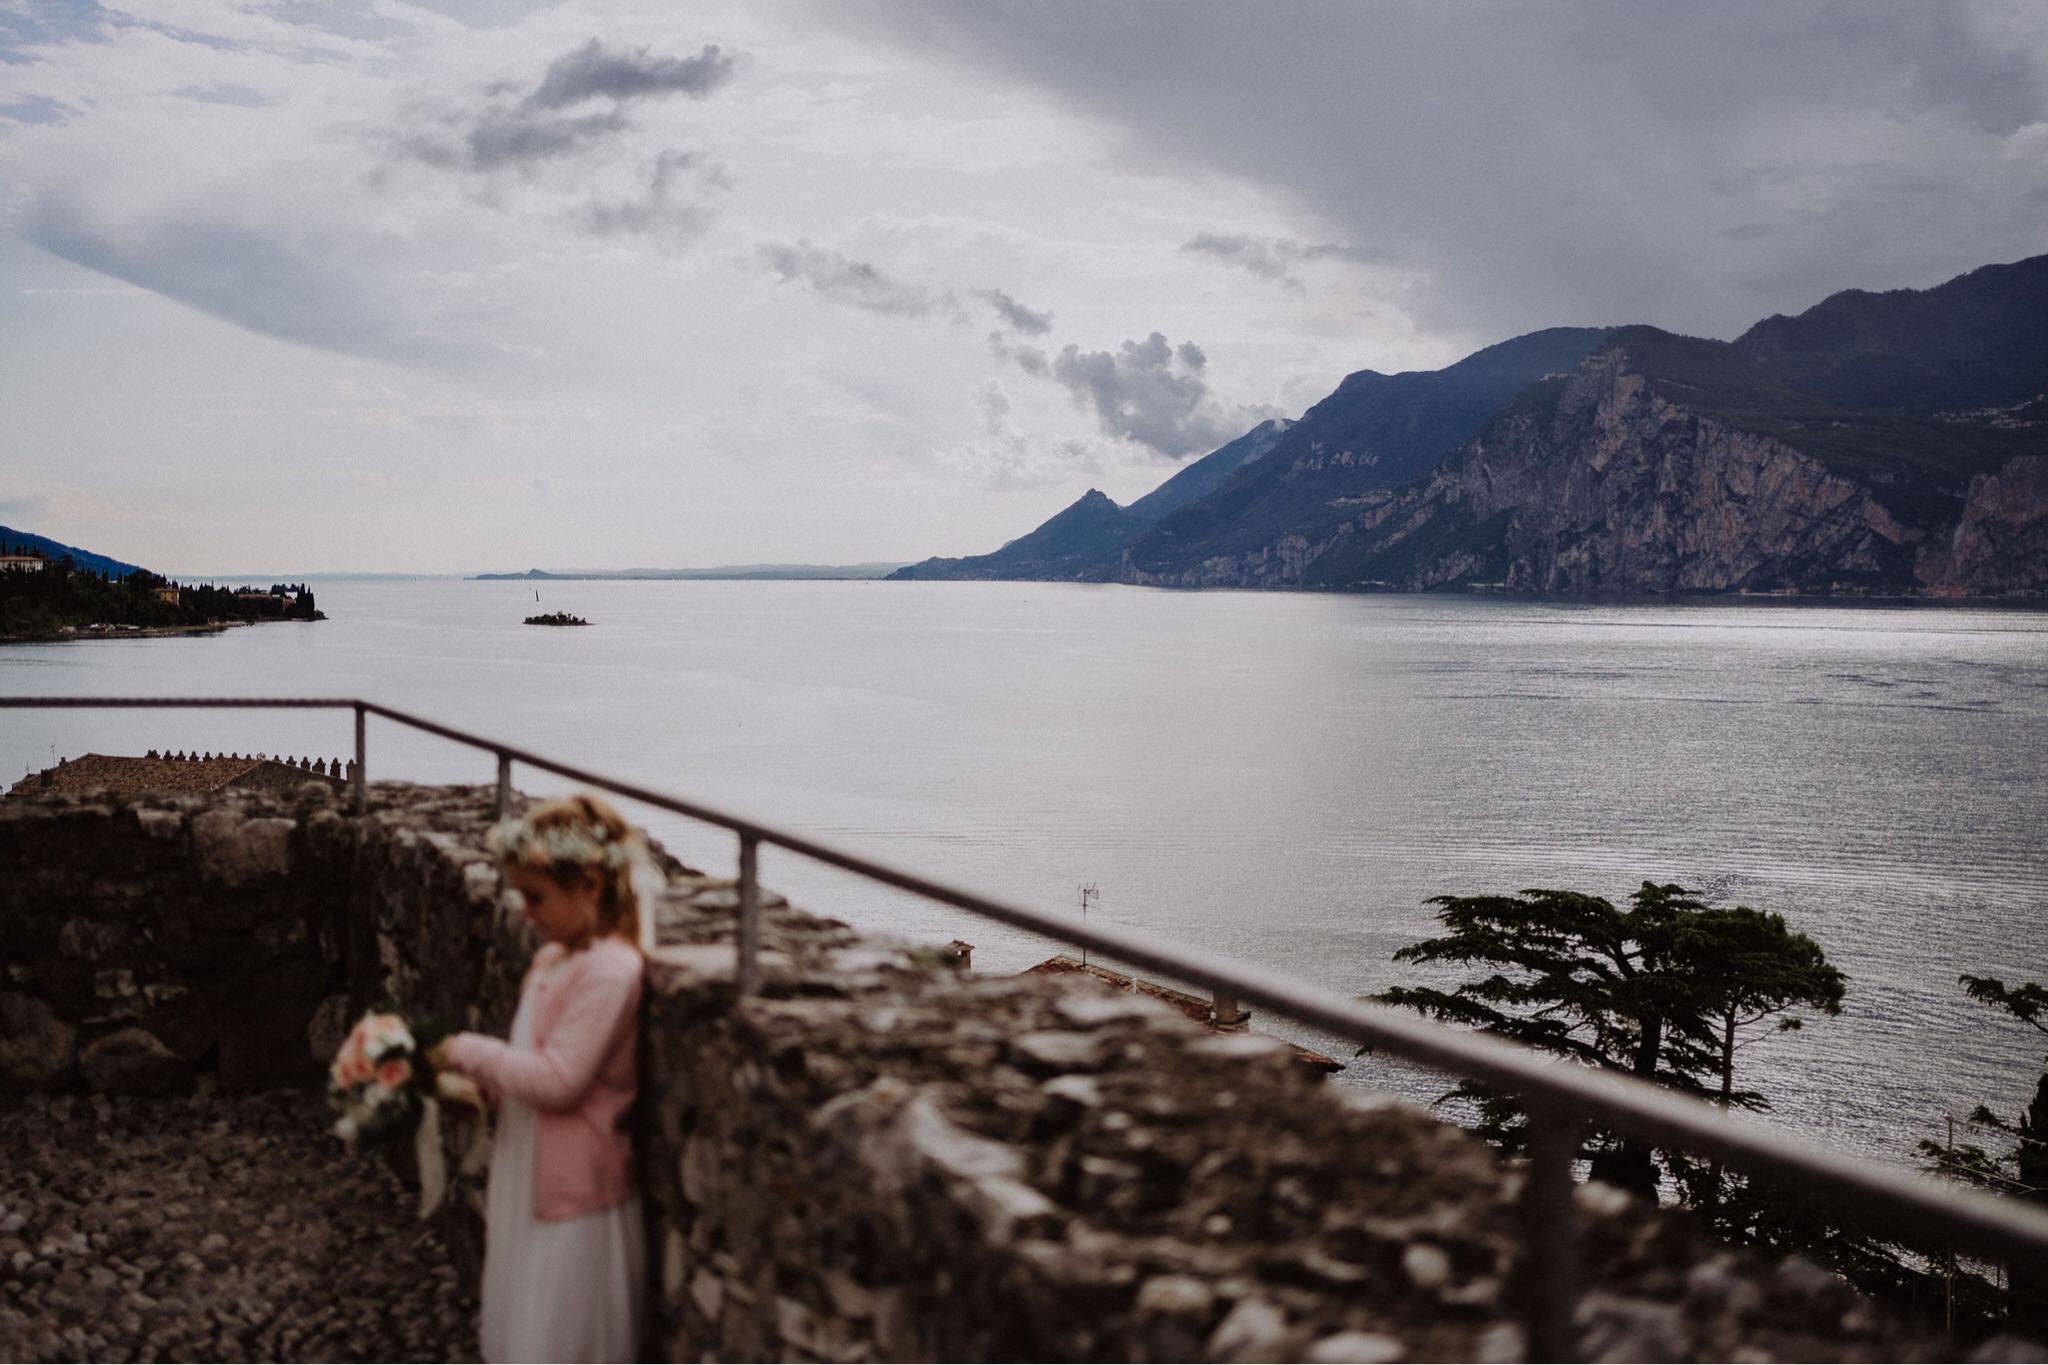 39 la 03 zeremonie 1065 weddinphotographer Hochzeitsfotograf newzealand hamilton Weddingphotography Stuttgart